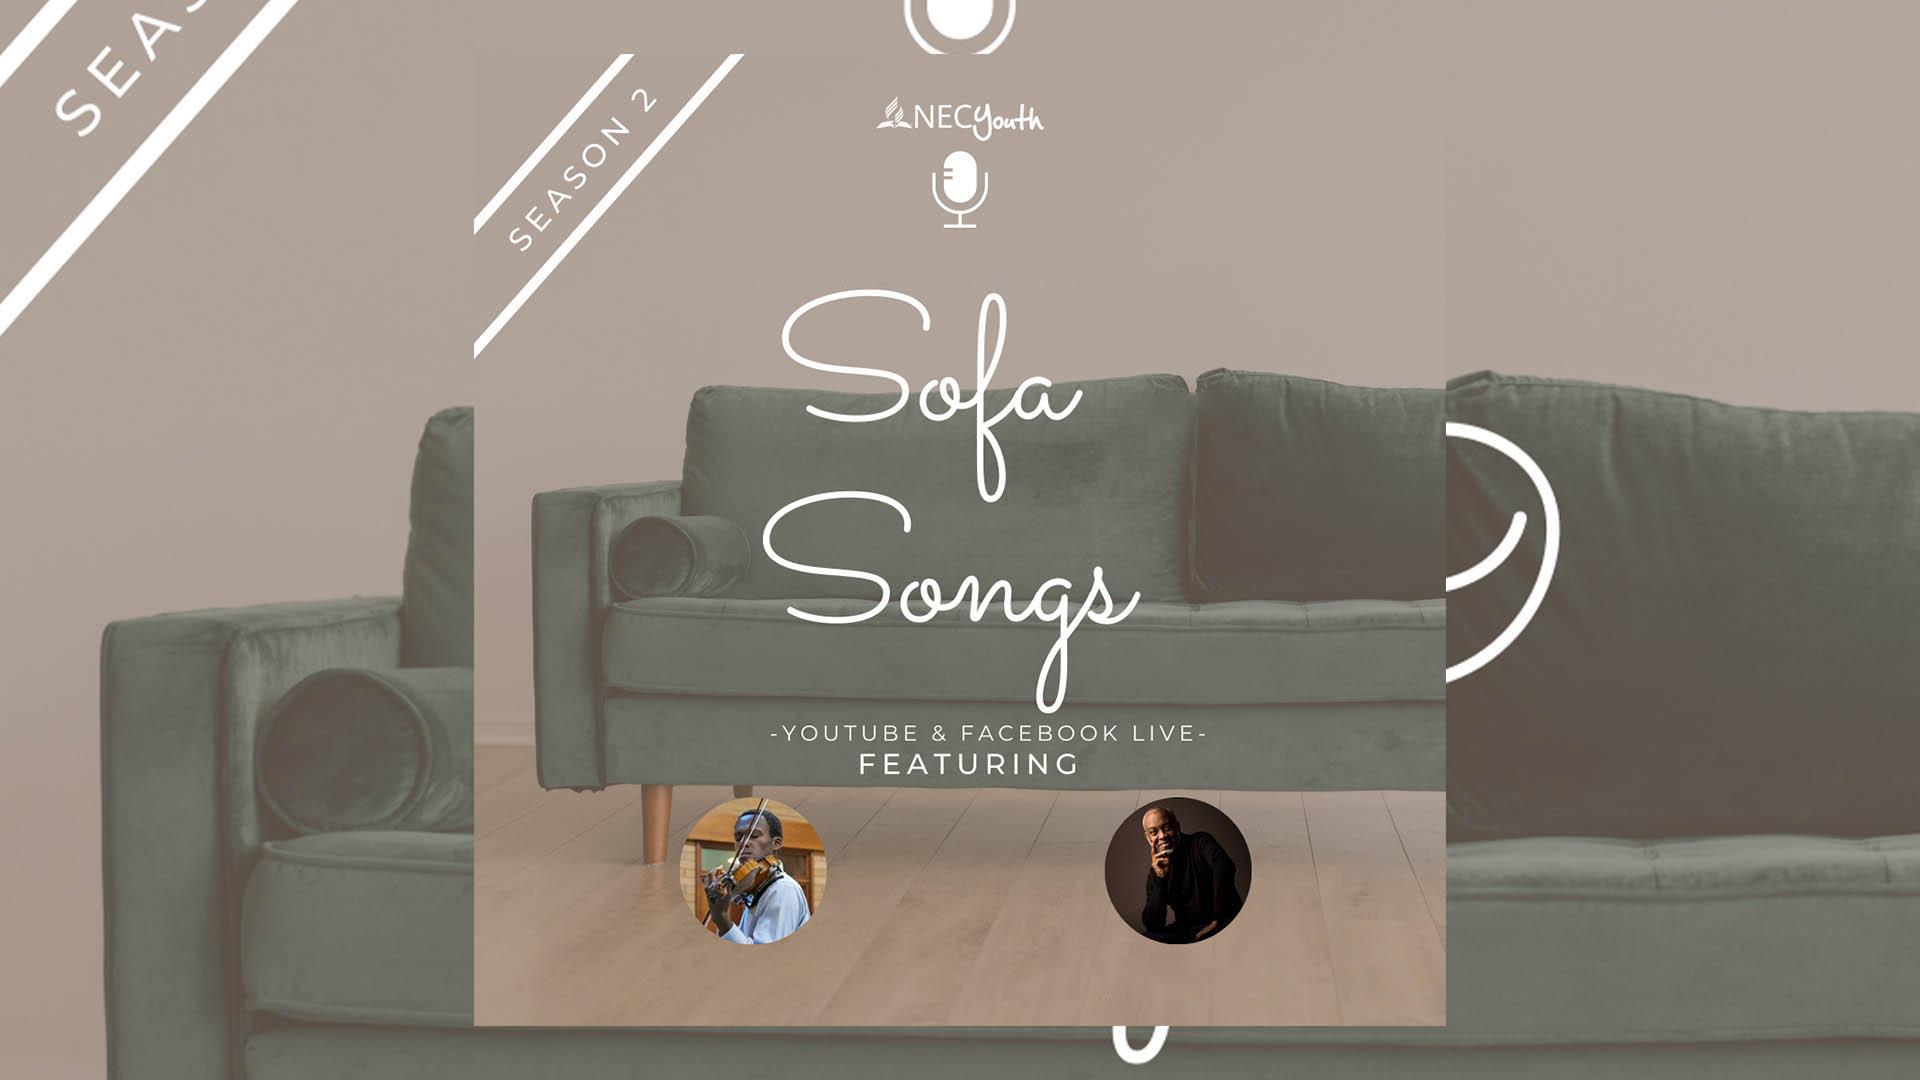 Sofa Songs YT